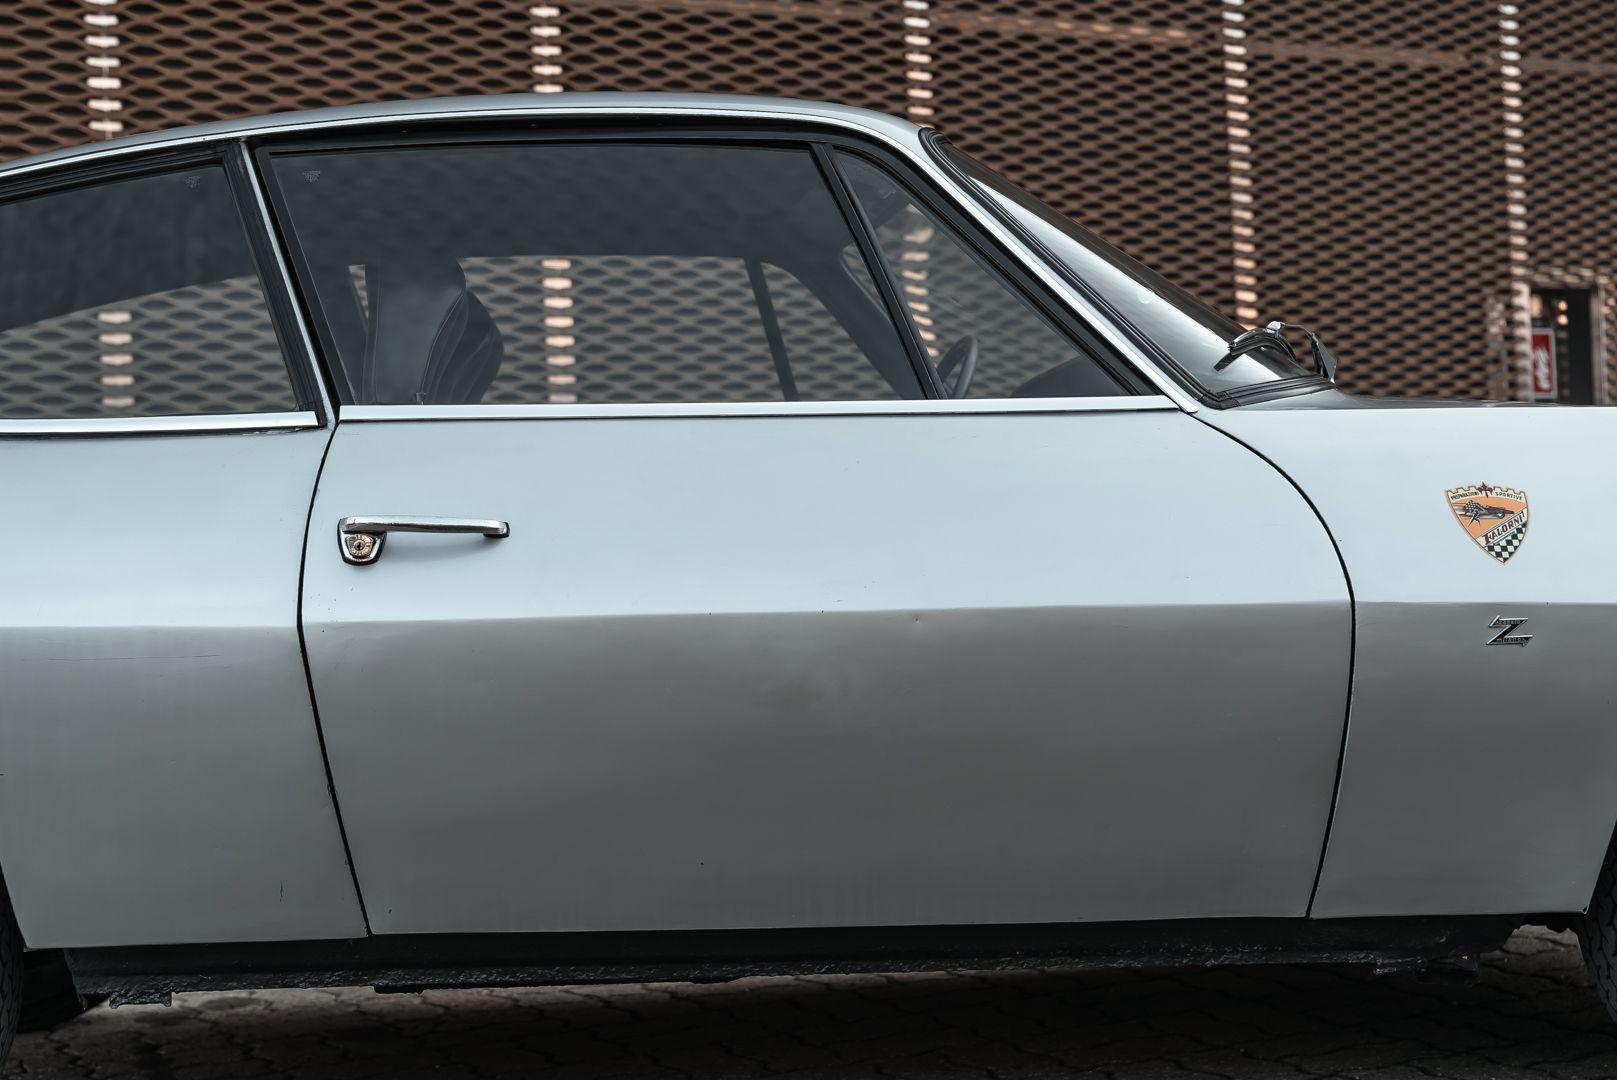 1972 Lancia Fulvia Sport 1.3 S 79375